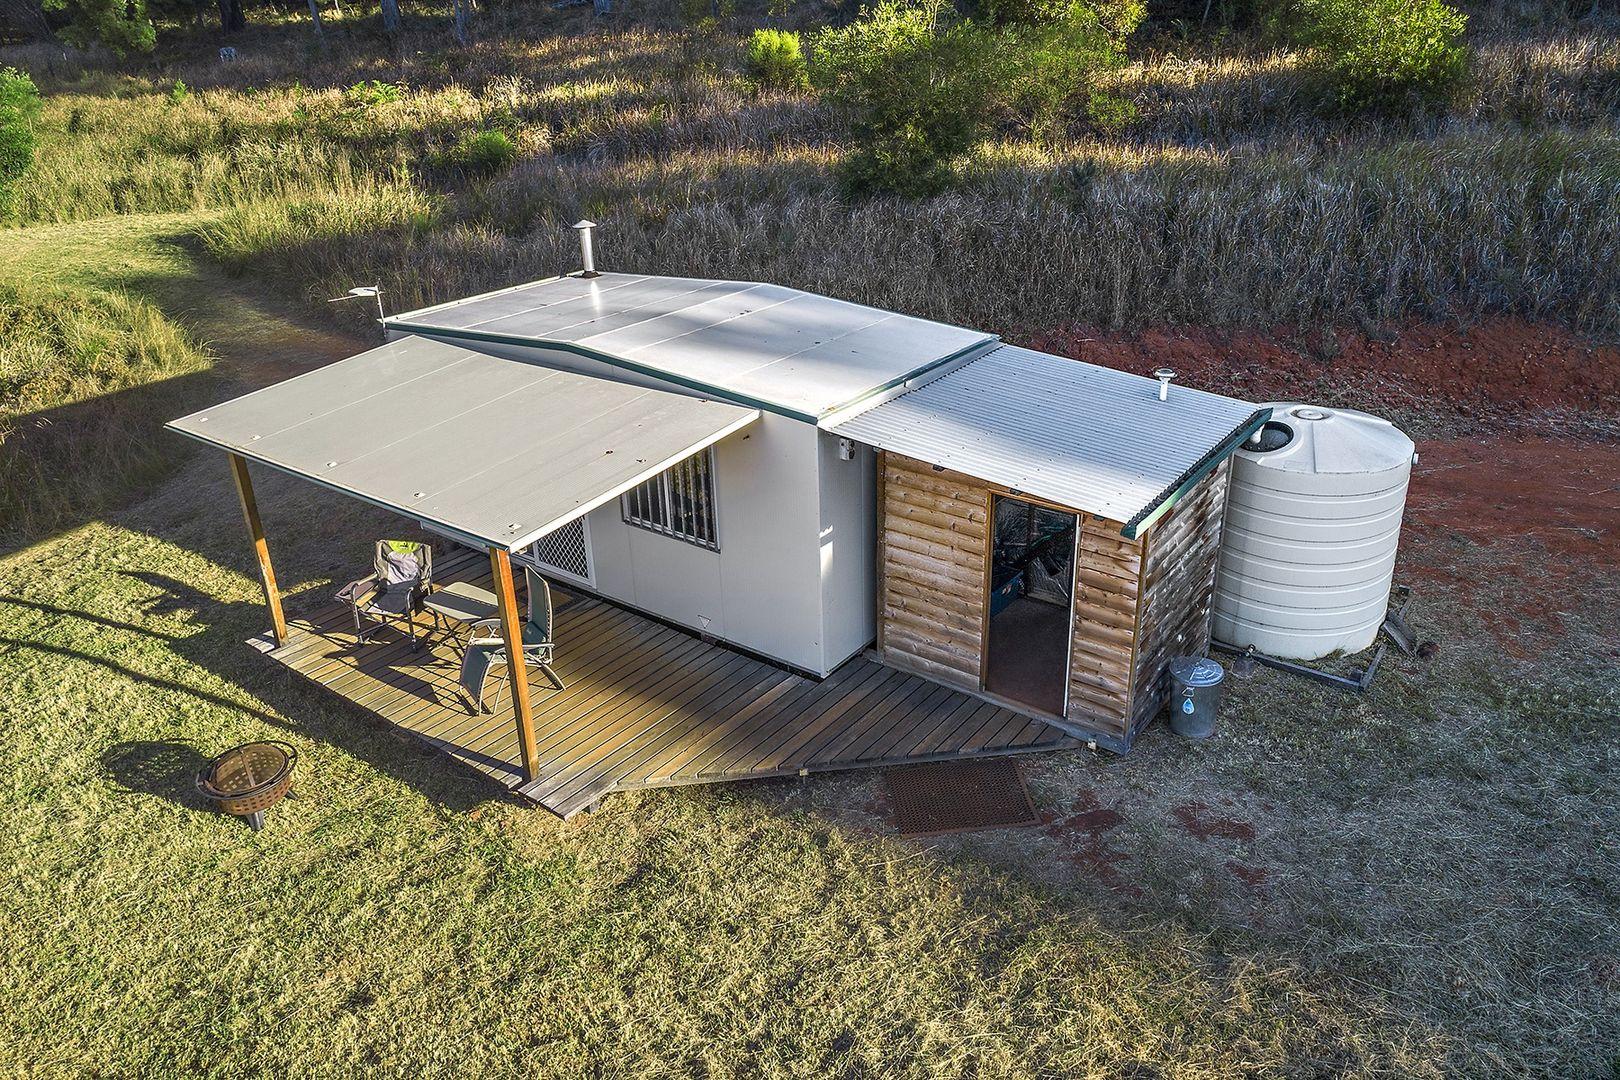 2/77 Sheepstation Creek Road, Tyringham, Dorrigo NSW 2453, Image 1